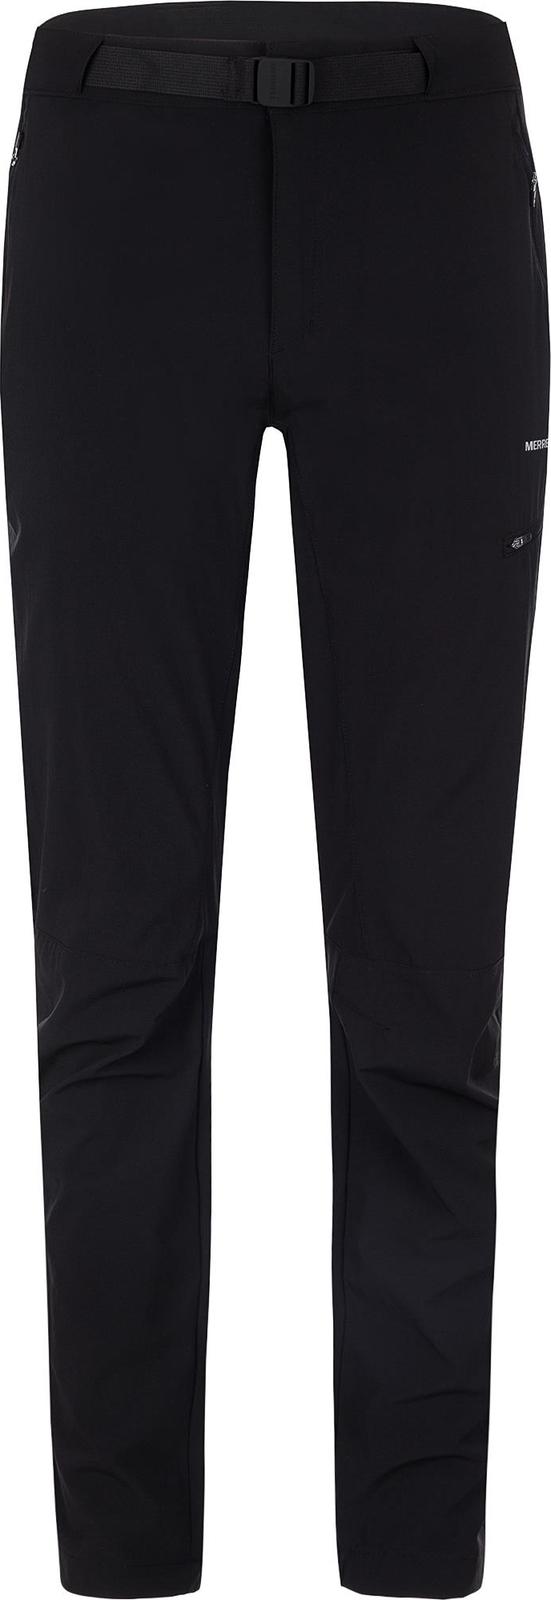 цены на Брюки Merrell Men's Trousers  в интернет-магазинах